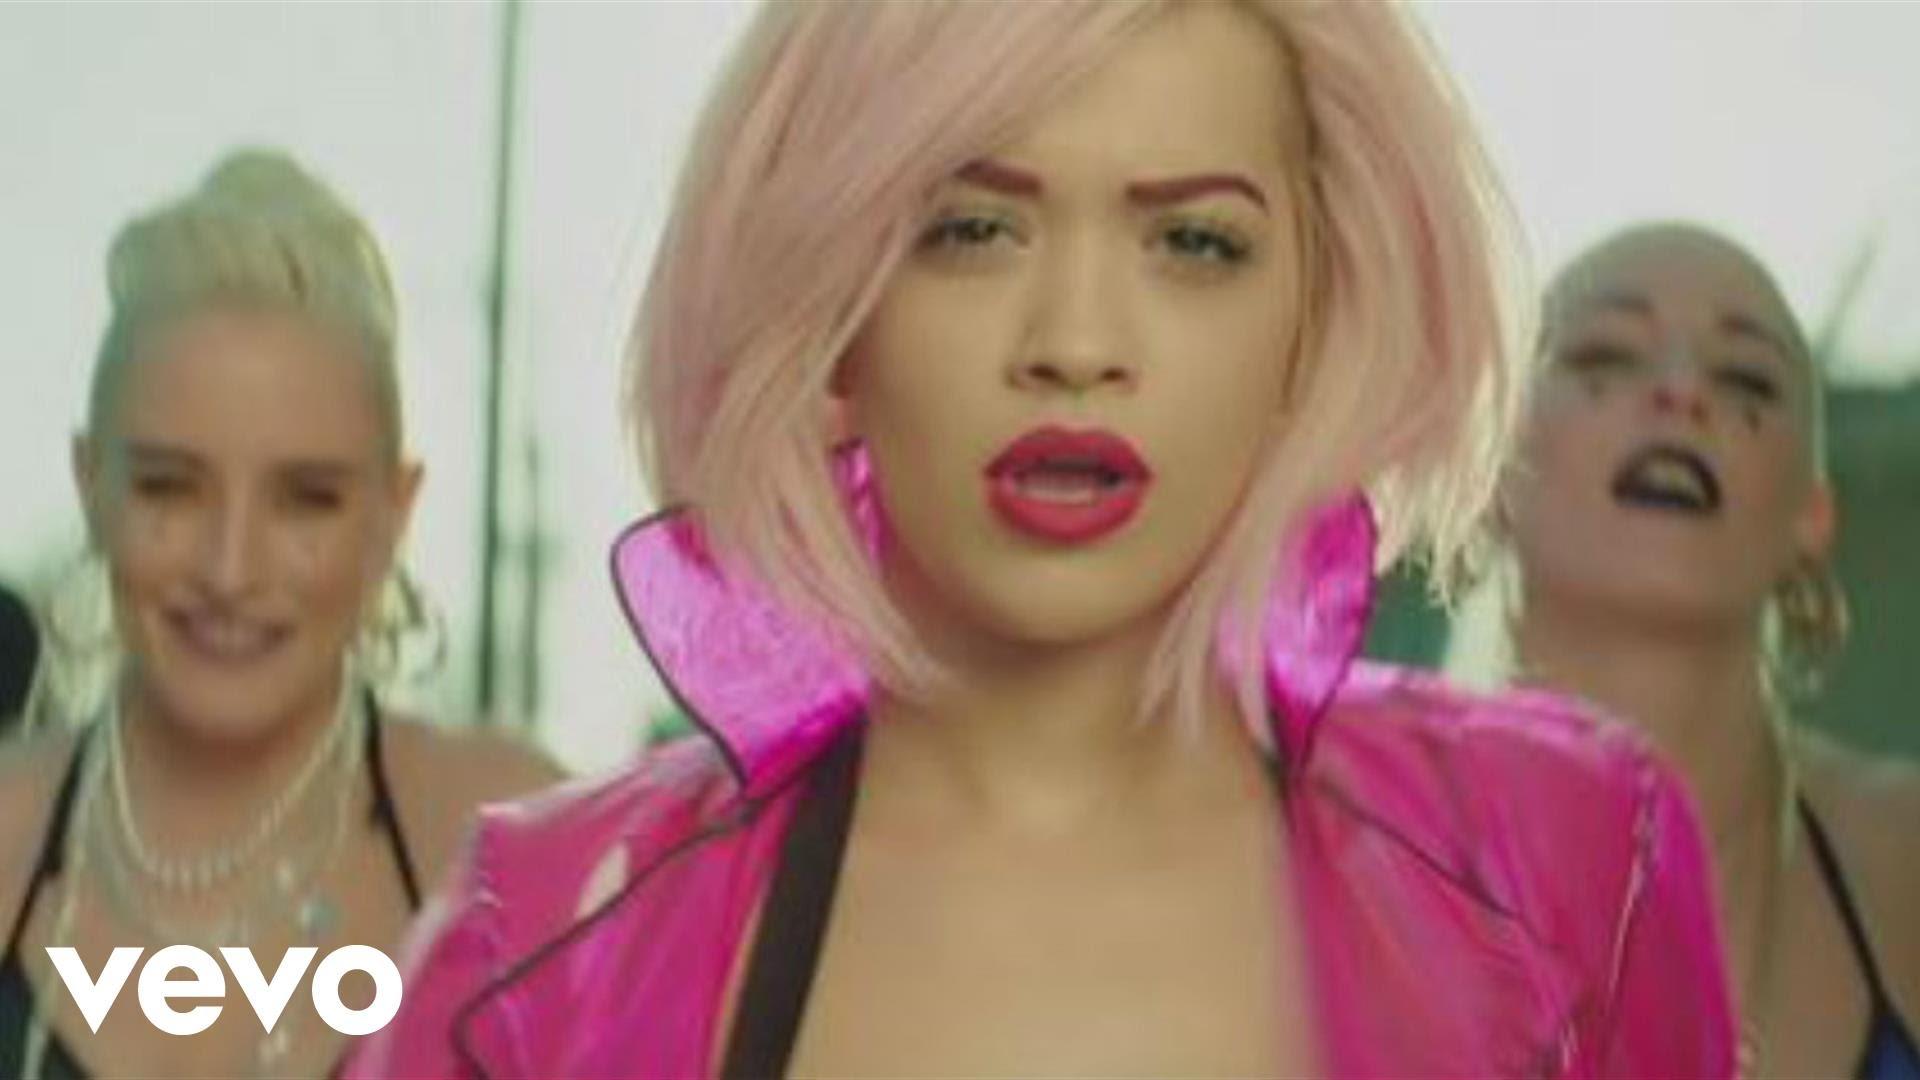 Rita Ora, Nick Carter and Spice Girls' Emma Bunton join ABC's 'Boy Band'